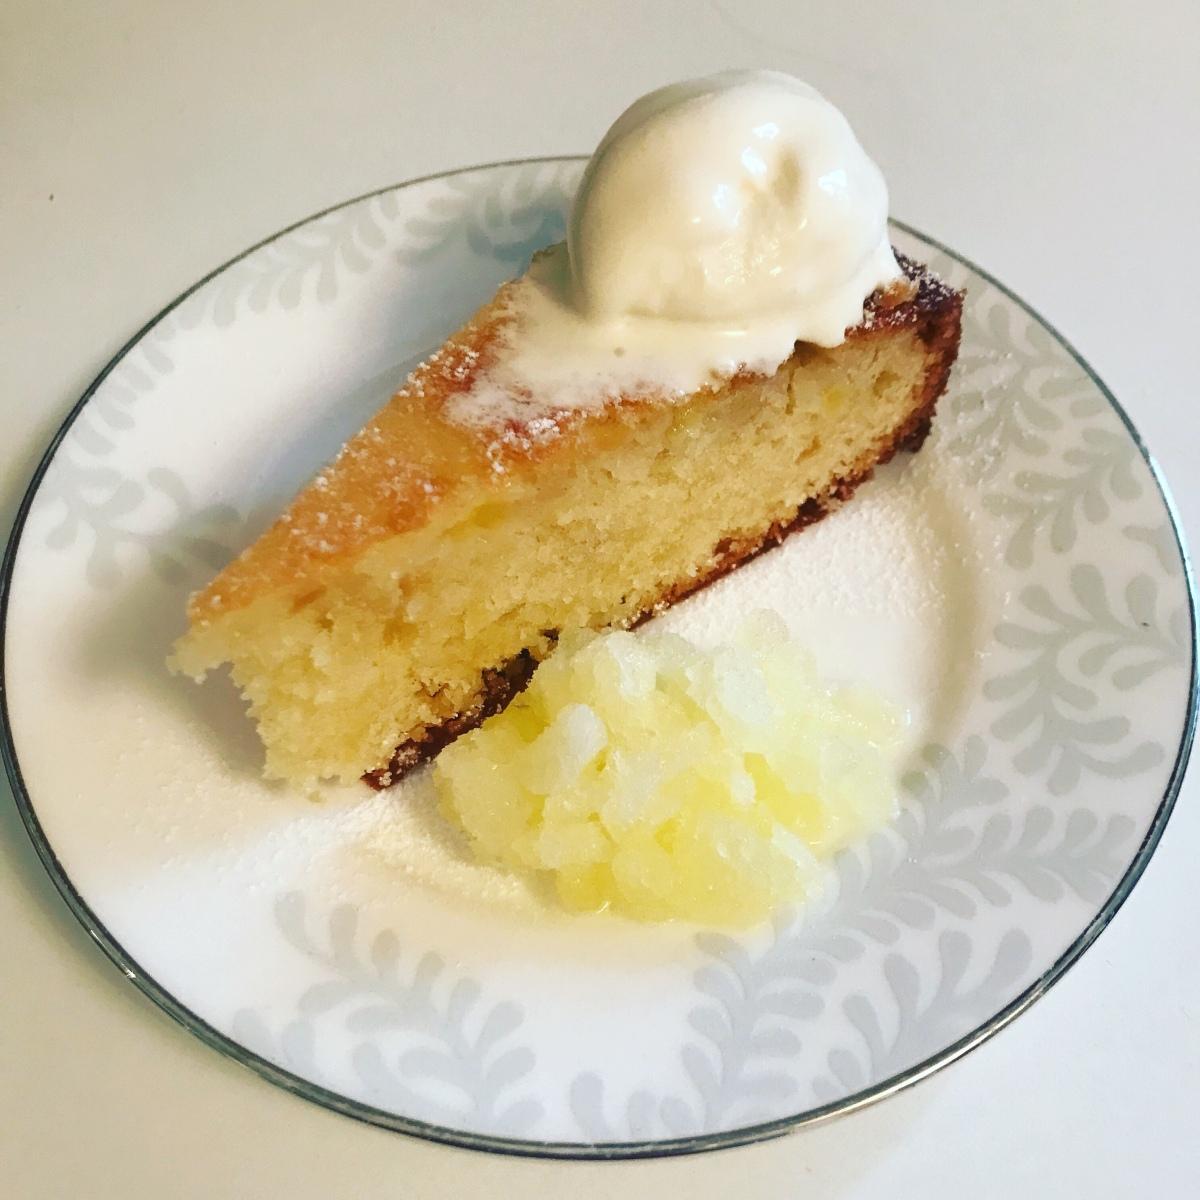 Pineapple and almondcake